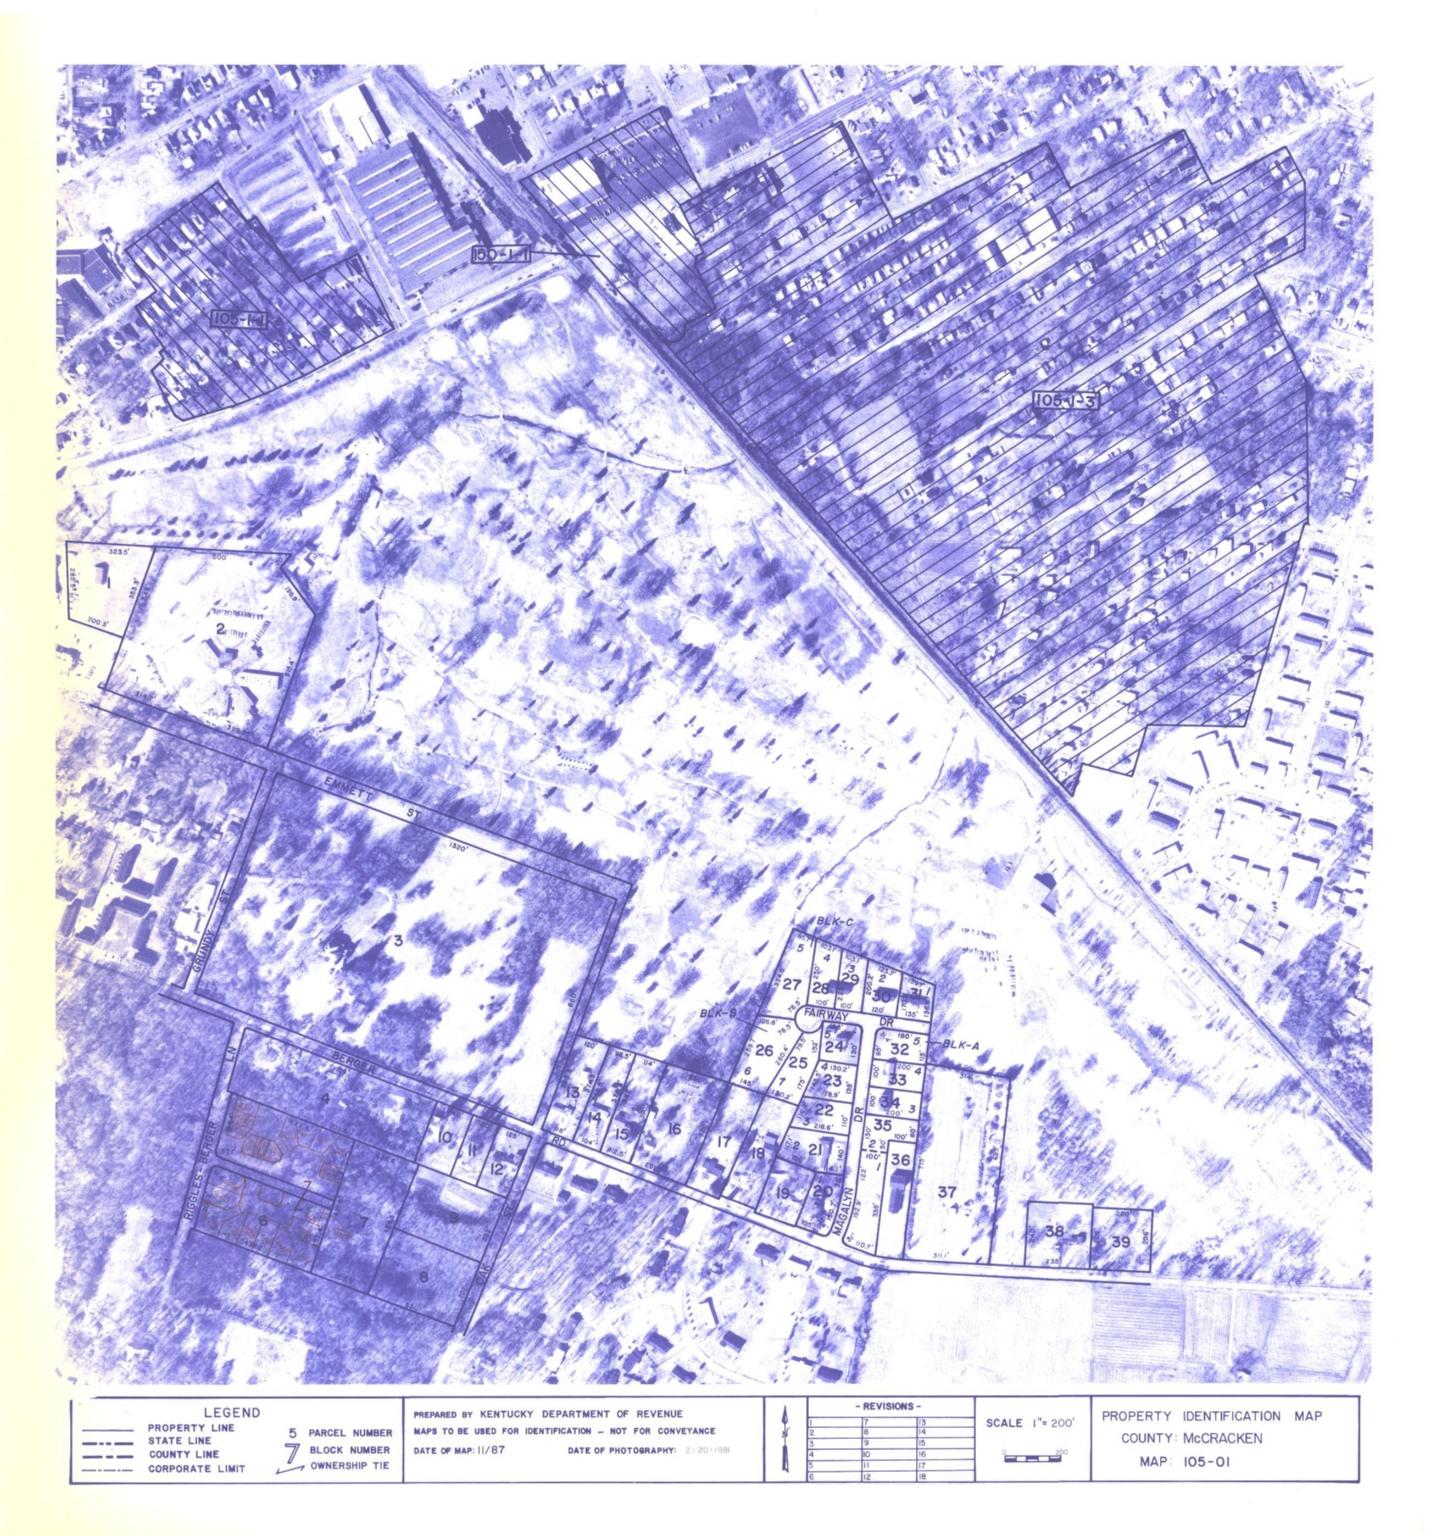 Property Identification Map McCracken County, Map 105-01